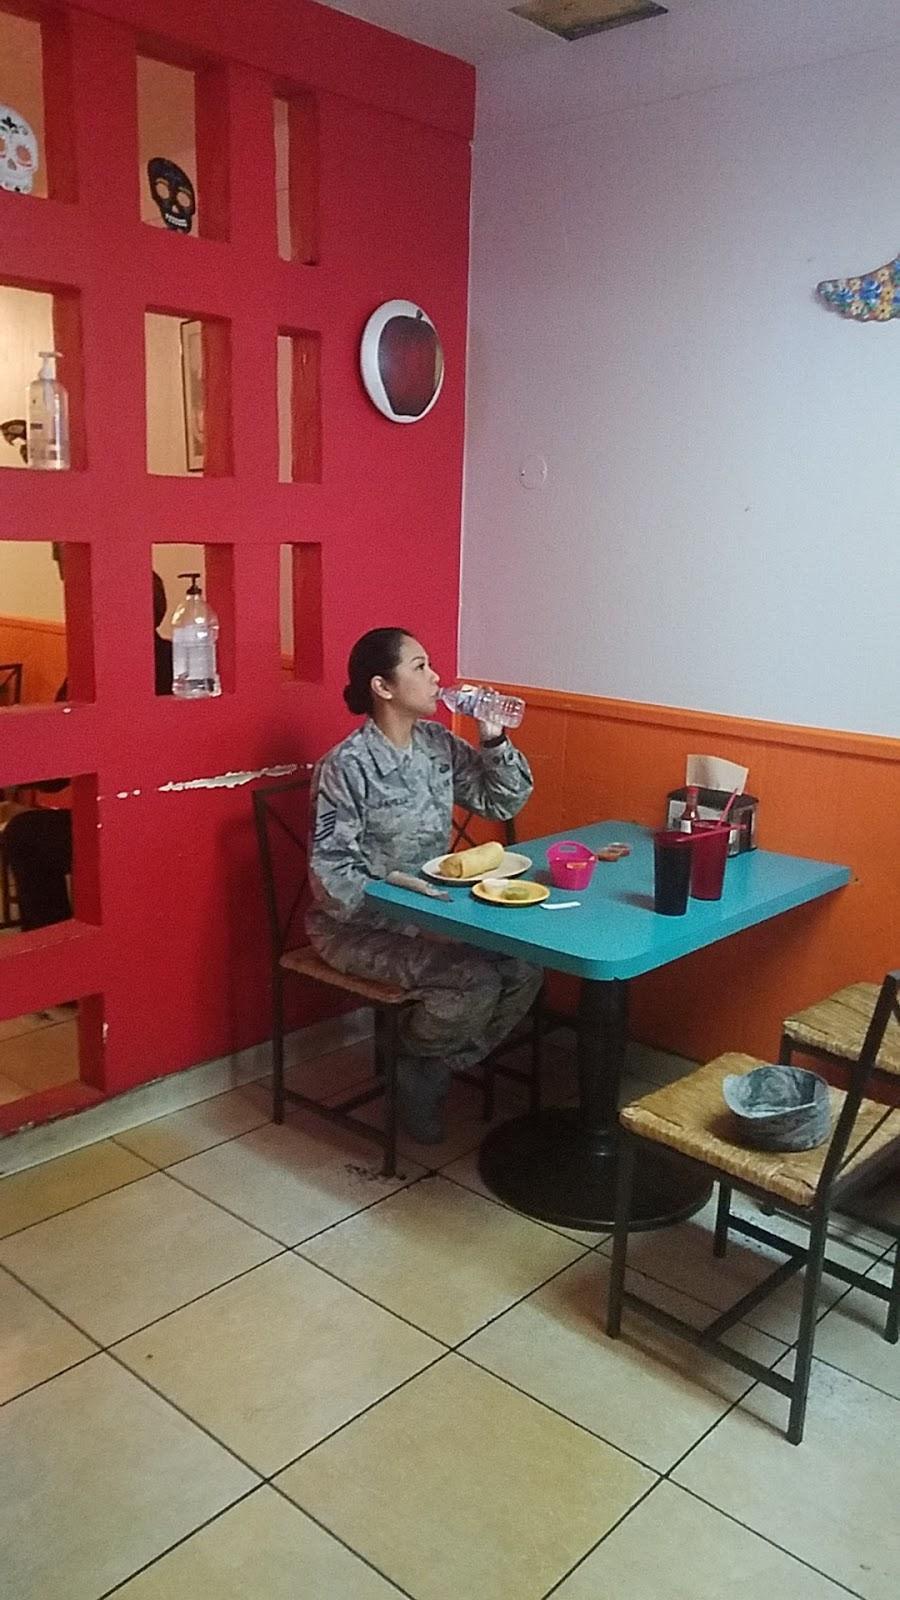 Hecho En Mexico Taqueria - restaurant  | Photo 8 of 10 | Address: 672 Parker Rd, Fairfield, CA 94533, USA | Phone: (707) 437-3514